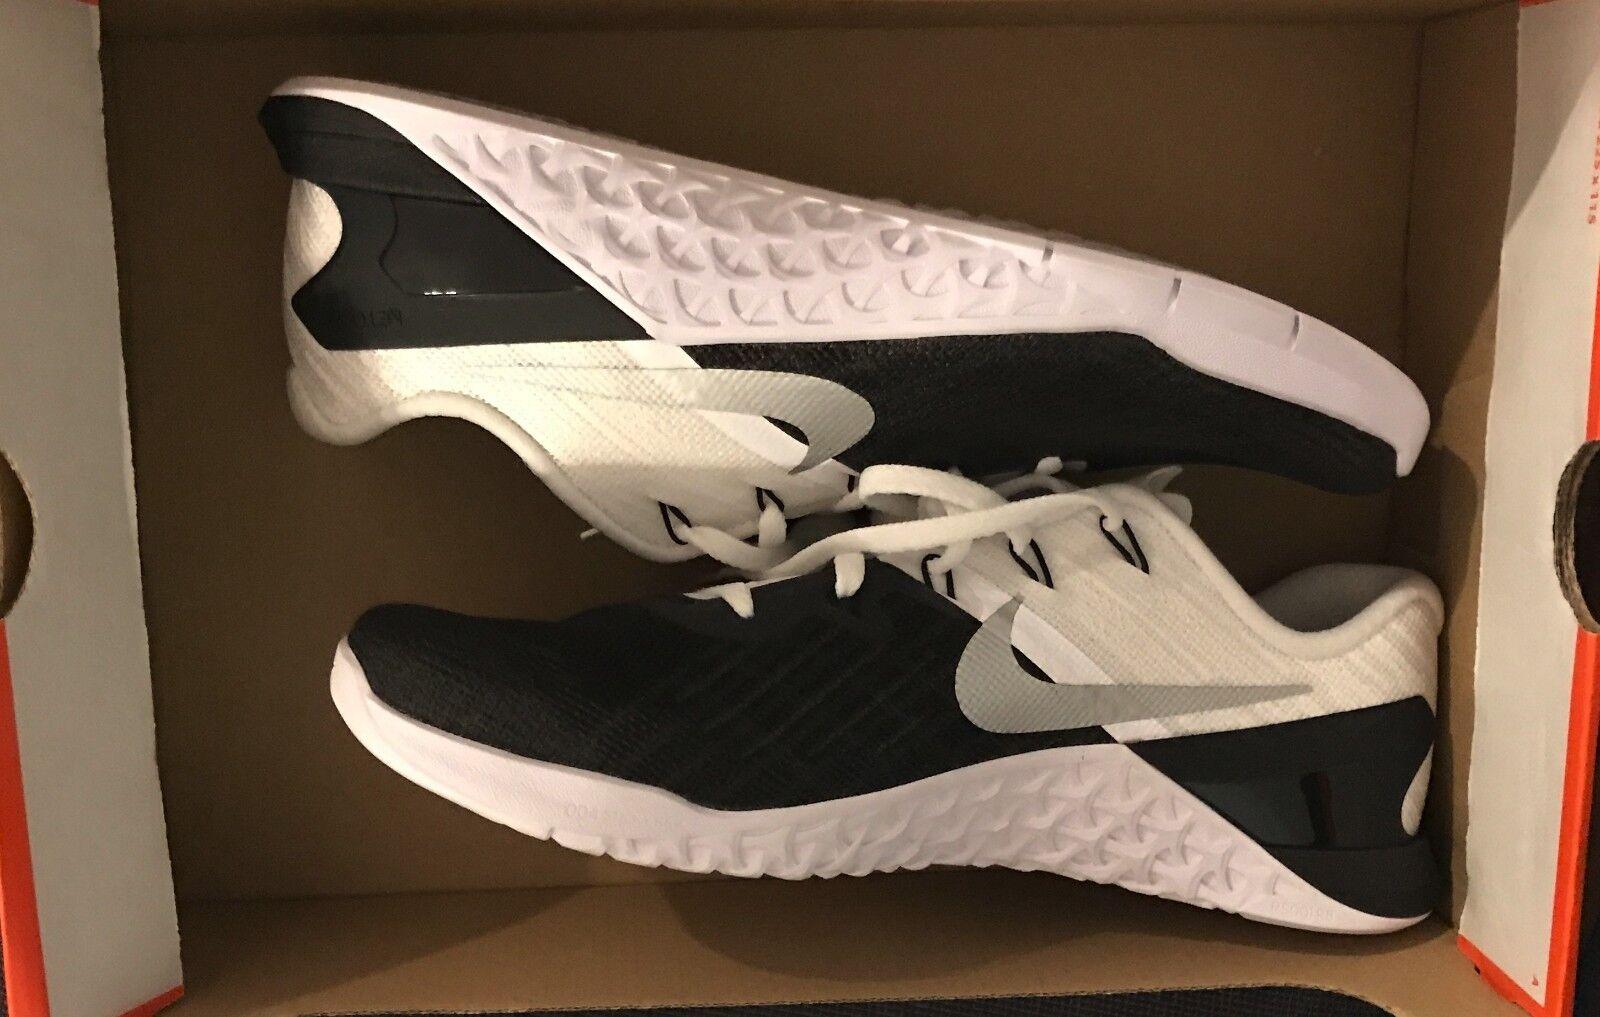 Nike Mens Metcon 3 shoes 852928 005 Black White Metallic Silver NO BOX TOP